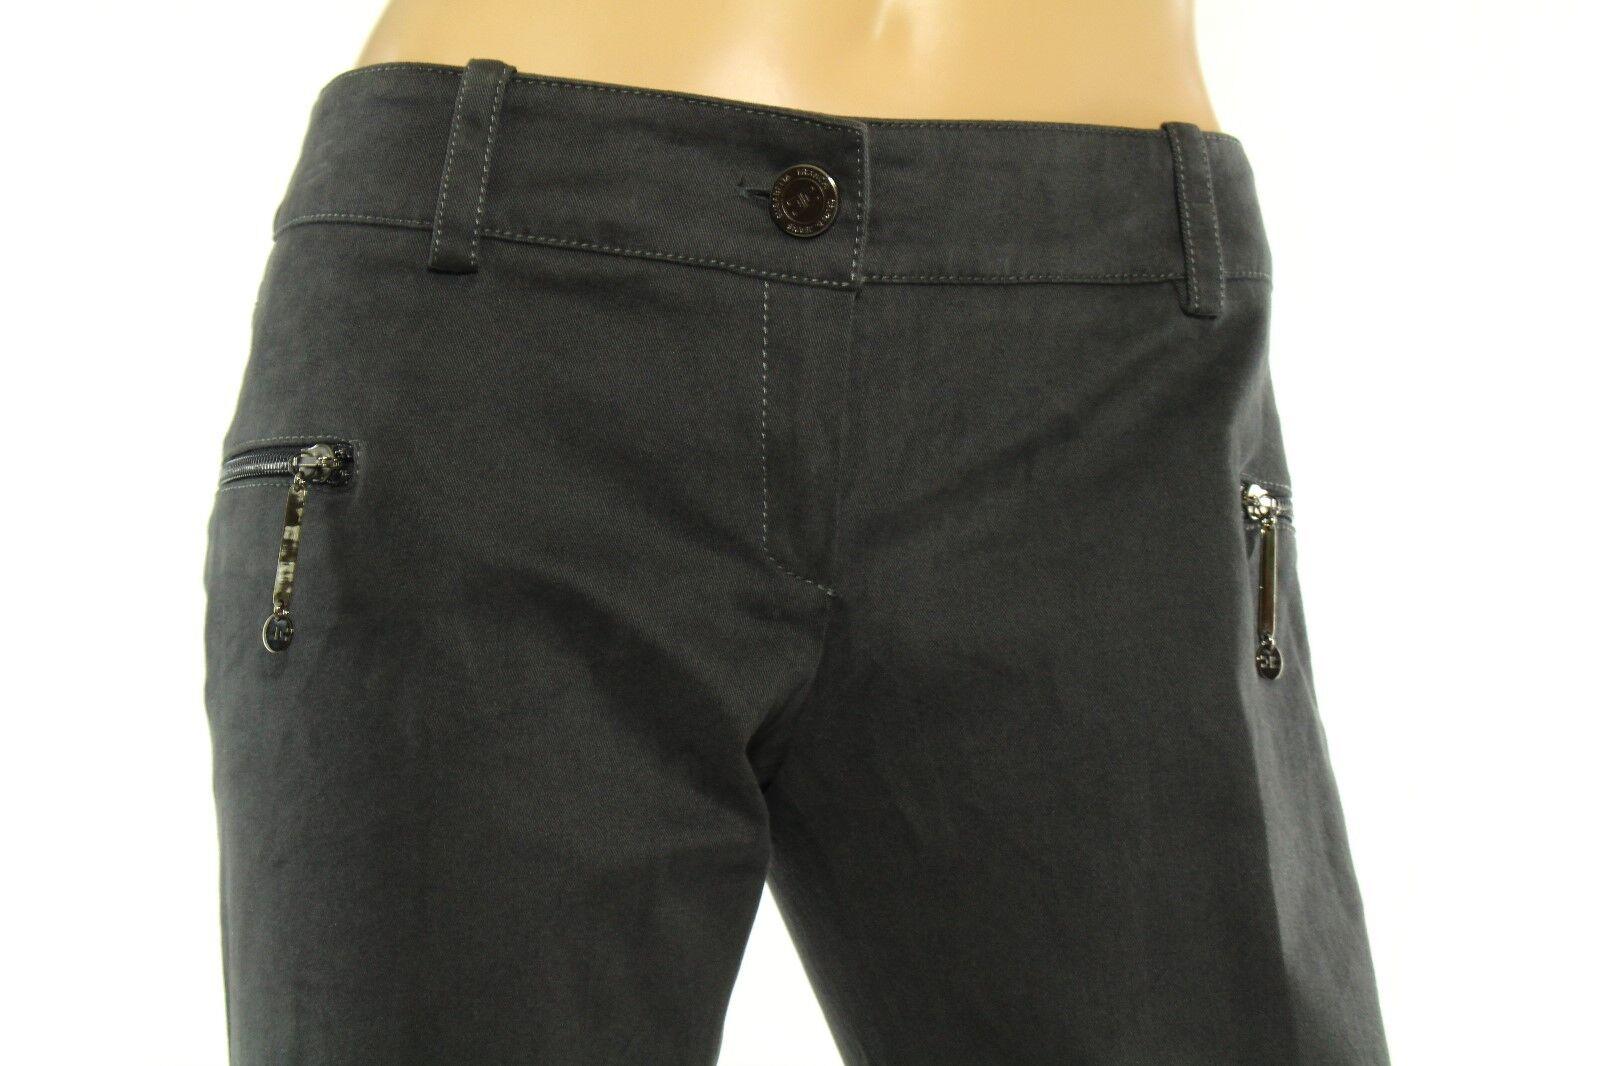 Eliasabetta Franchi Celyn B Damen Grau Enge Jeans Größe 44 (29 Us)